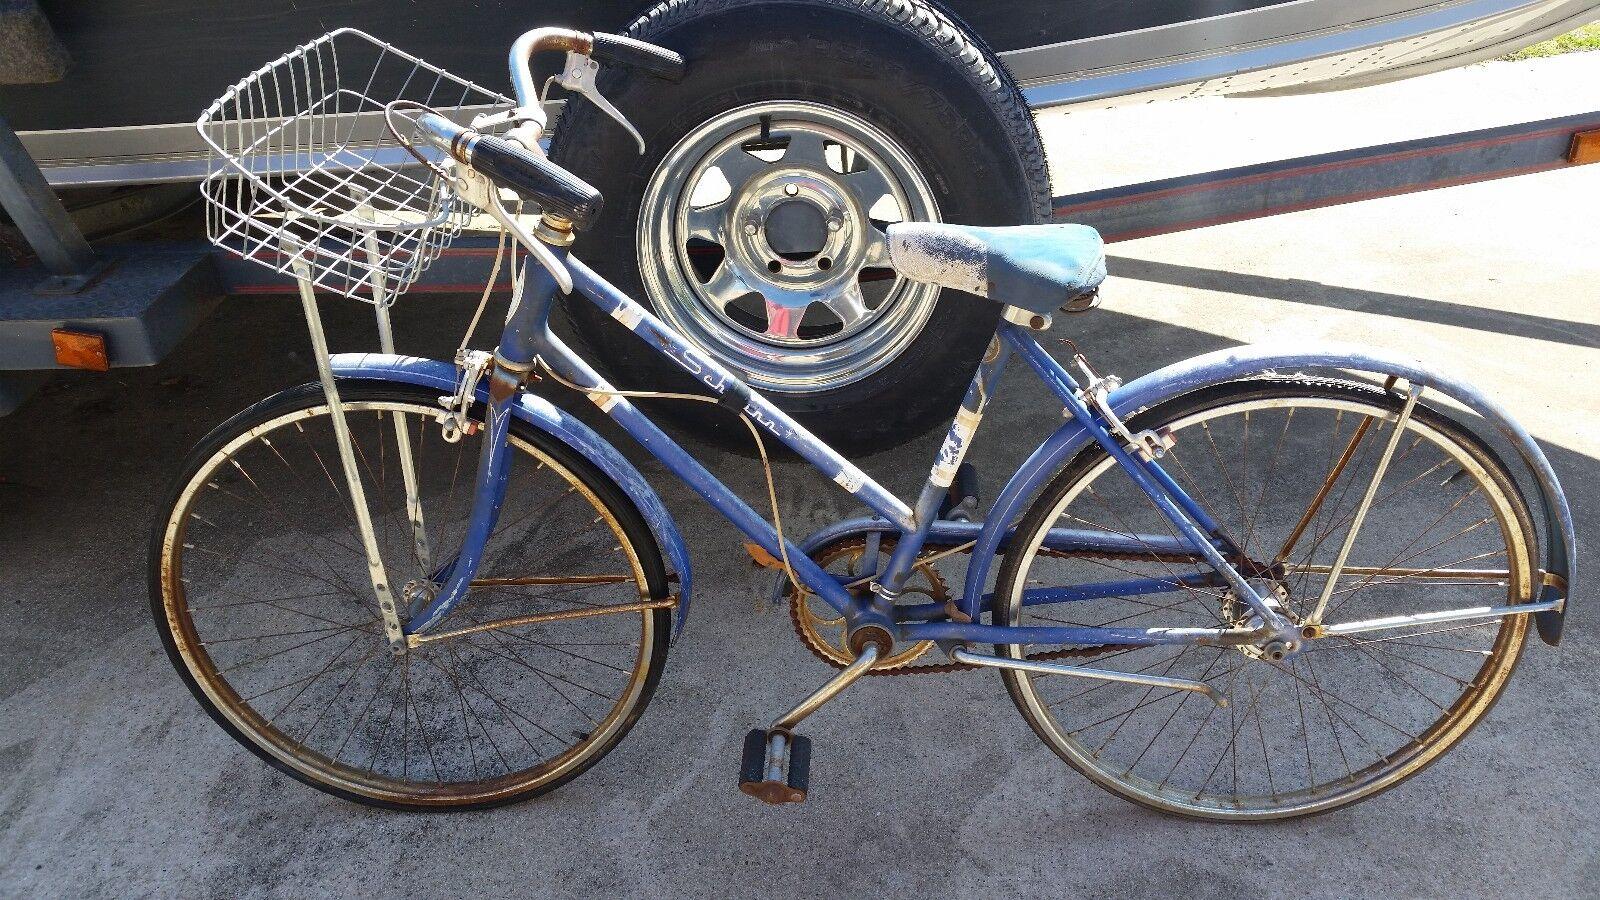 1960's  Schwinn  Vintage Bicycle  for cheap